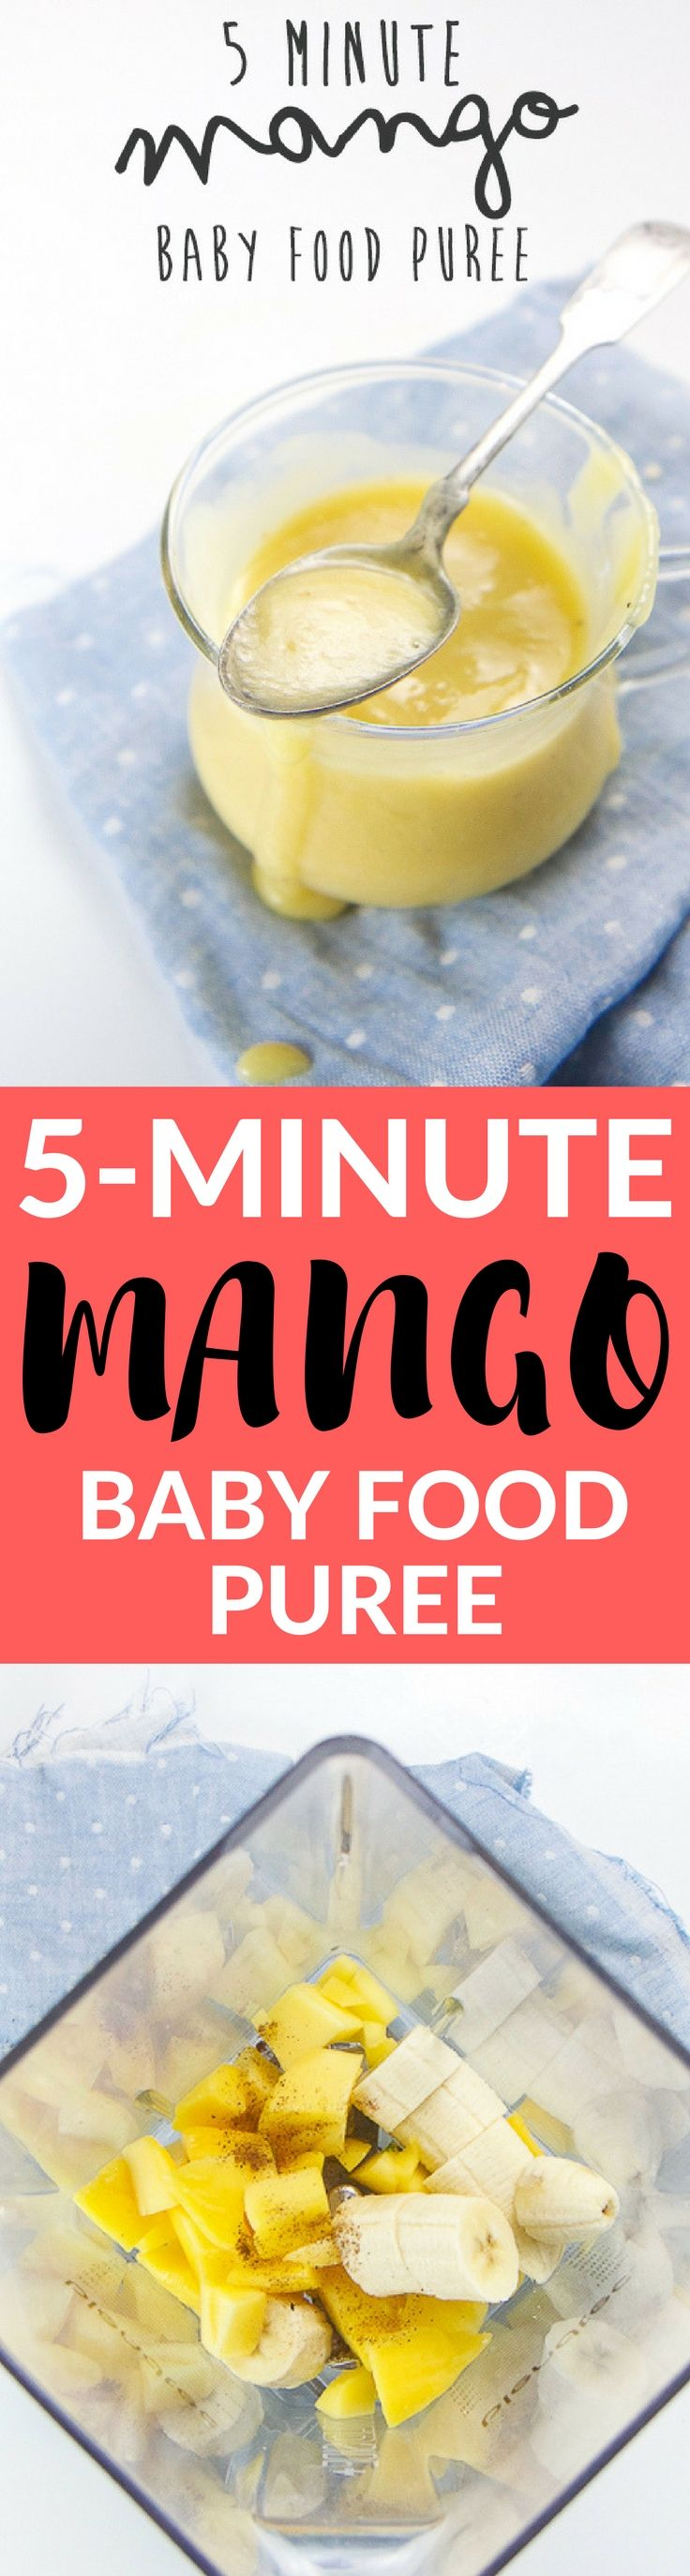 mango puree recipe for baby